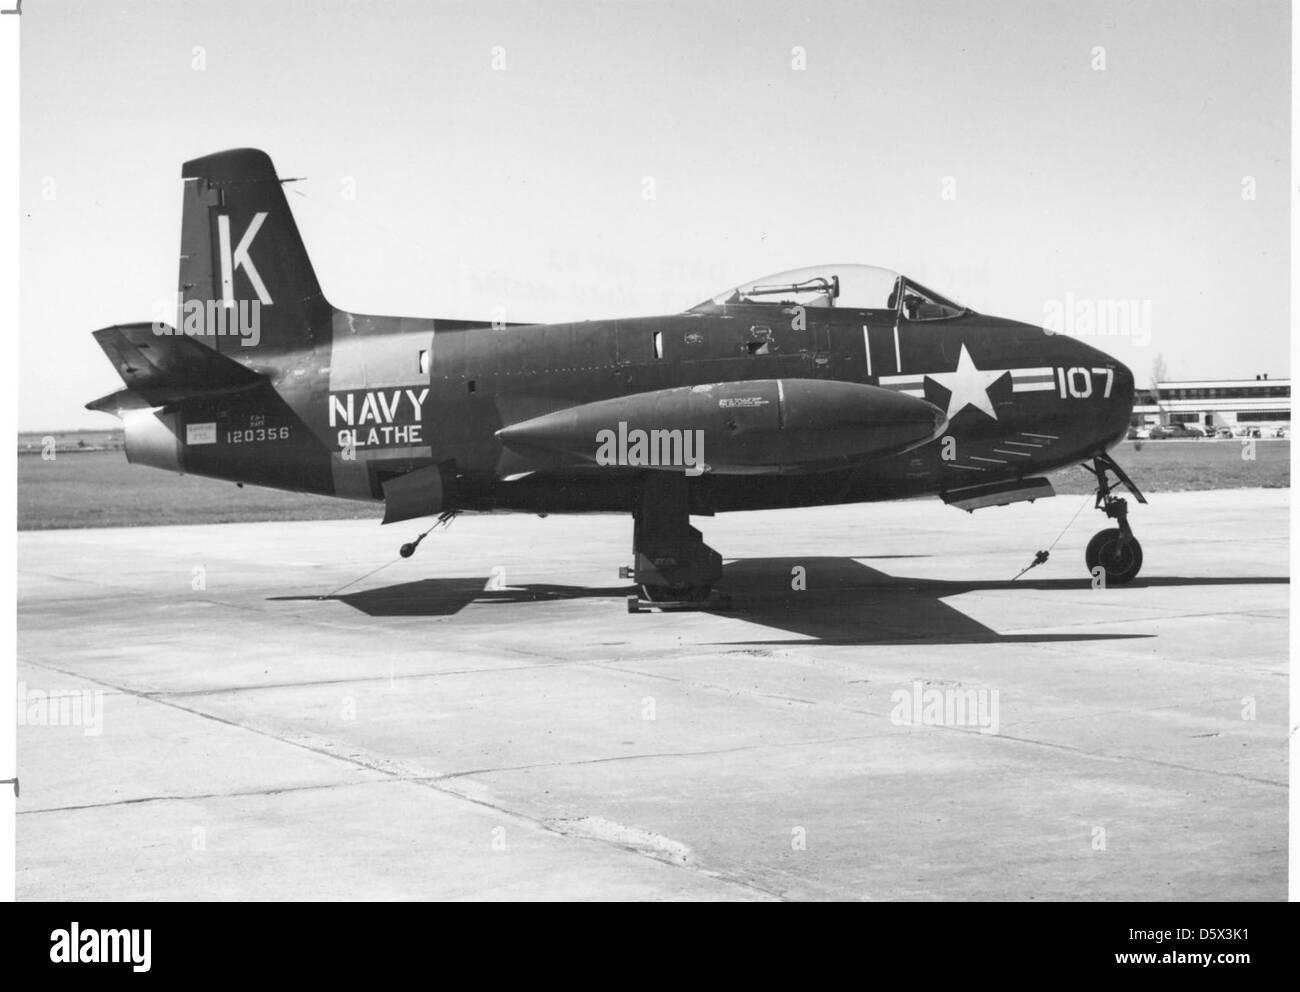 North American FJ-1 'Fury' of NARU Olathe at NAS Olathe, KS. - Stock Image